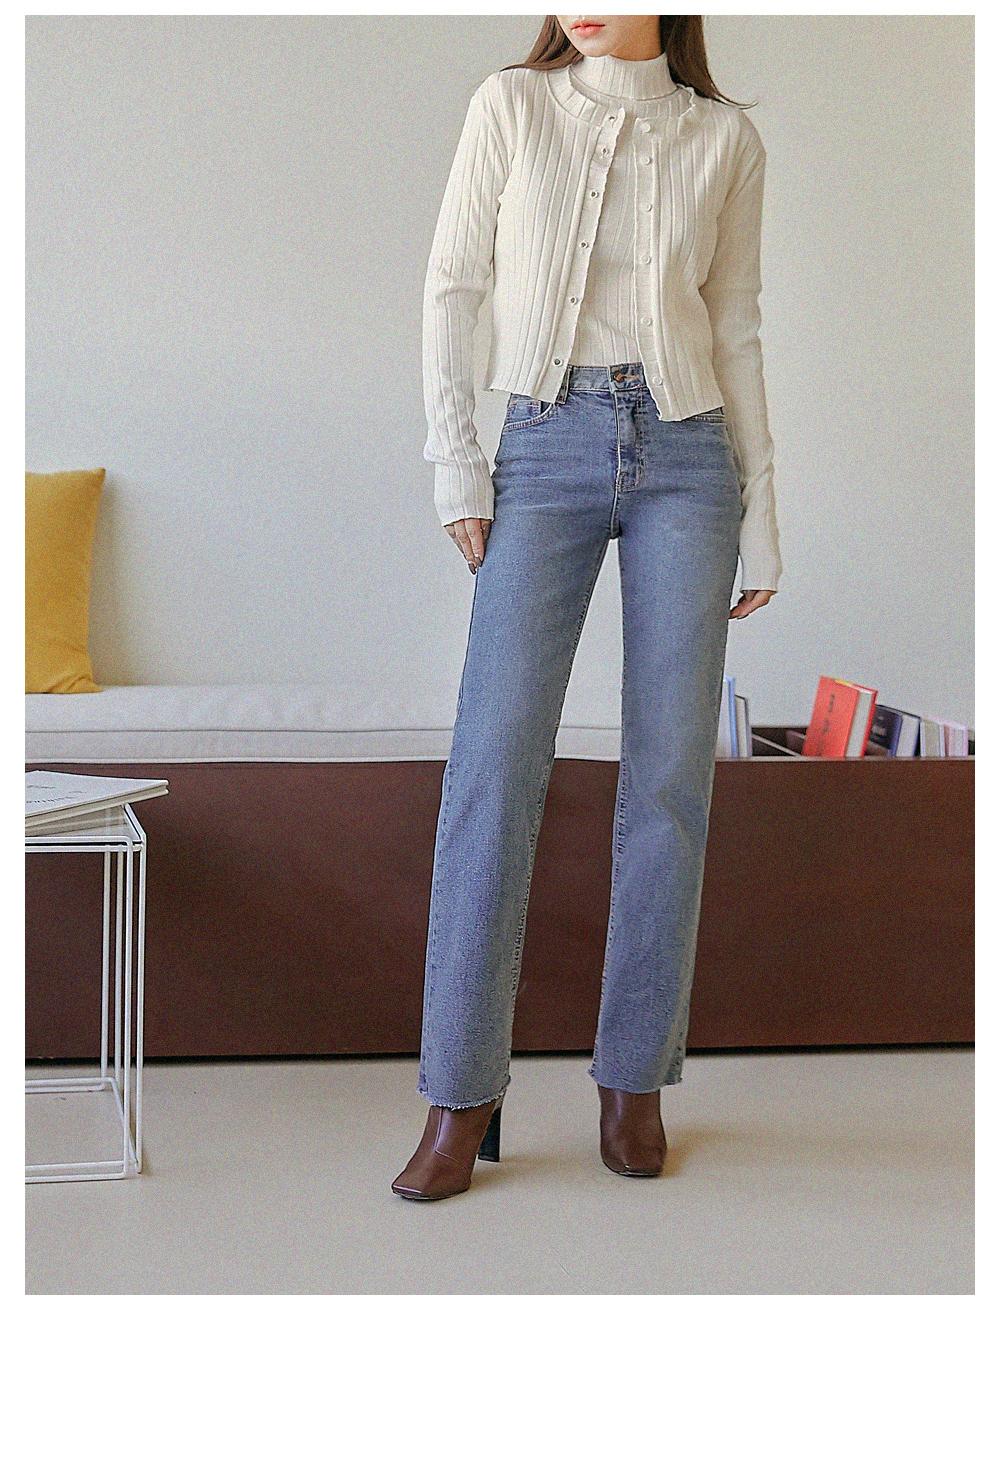 dress model image-S1L45